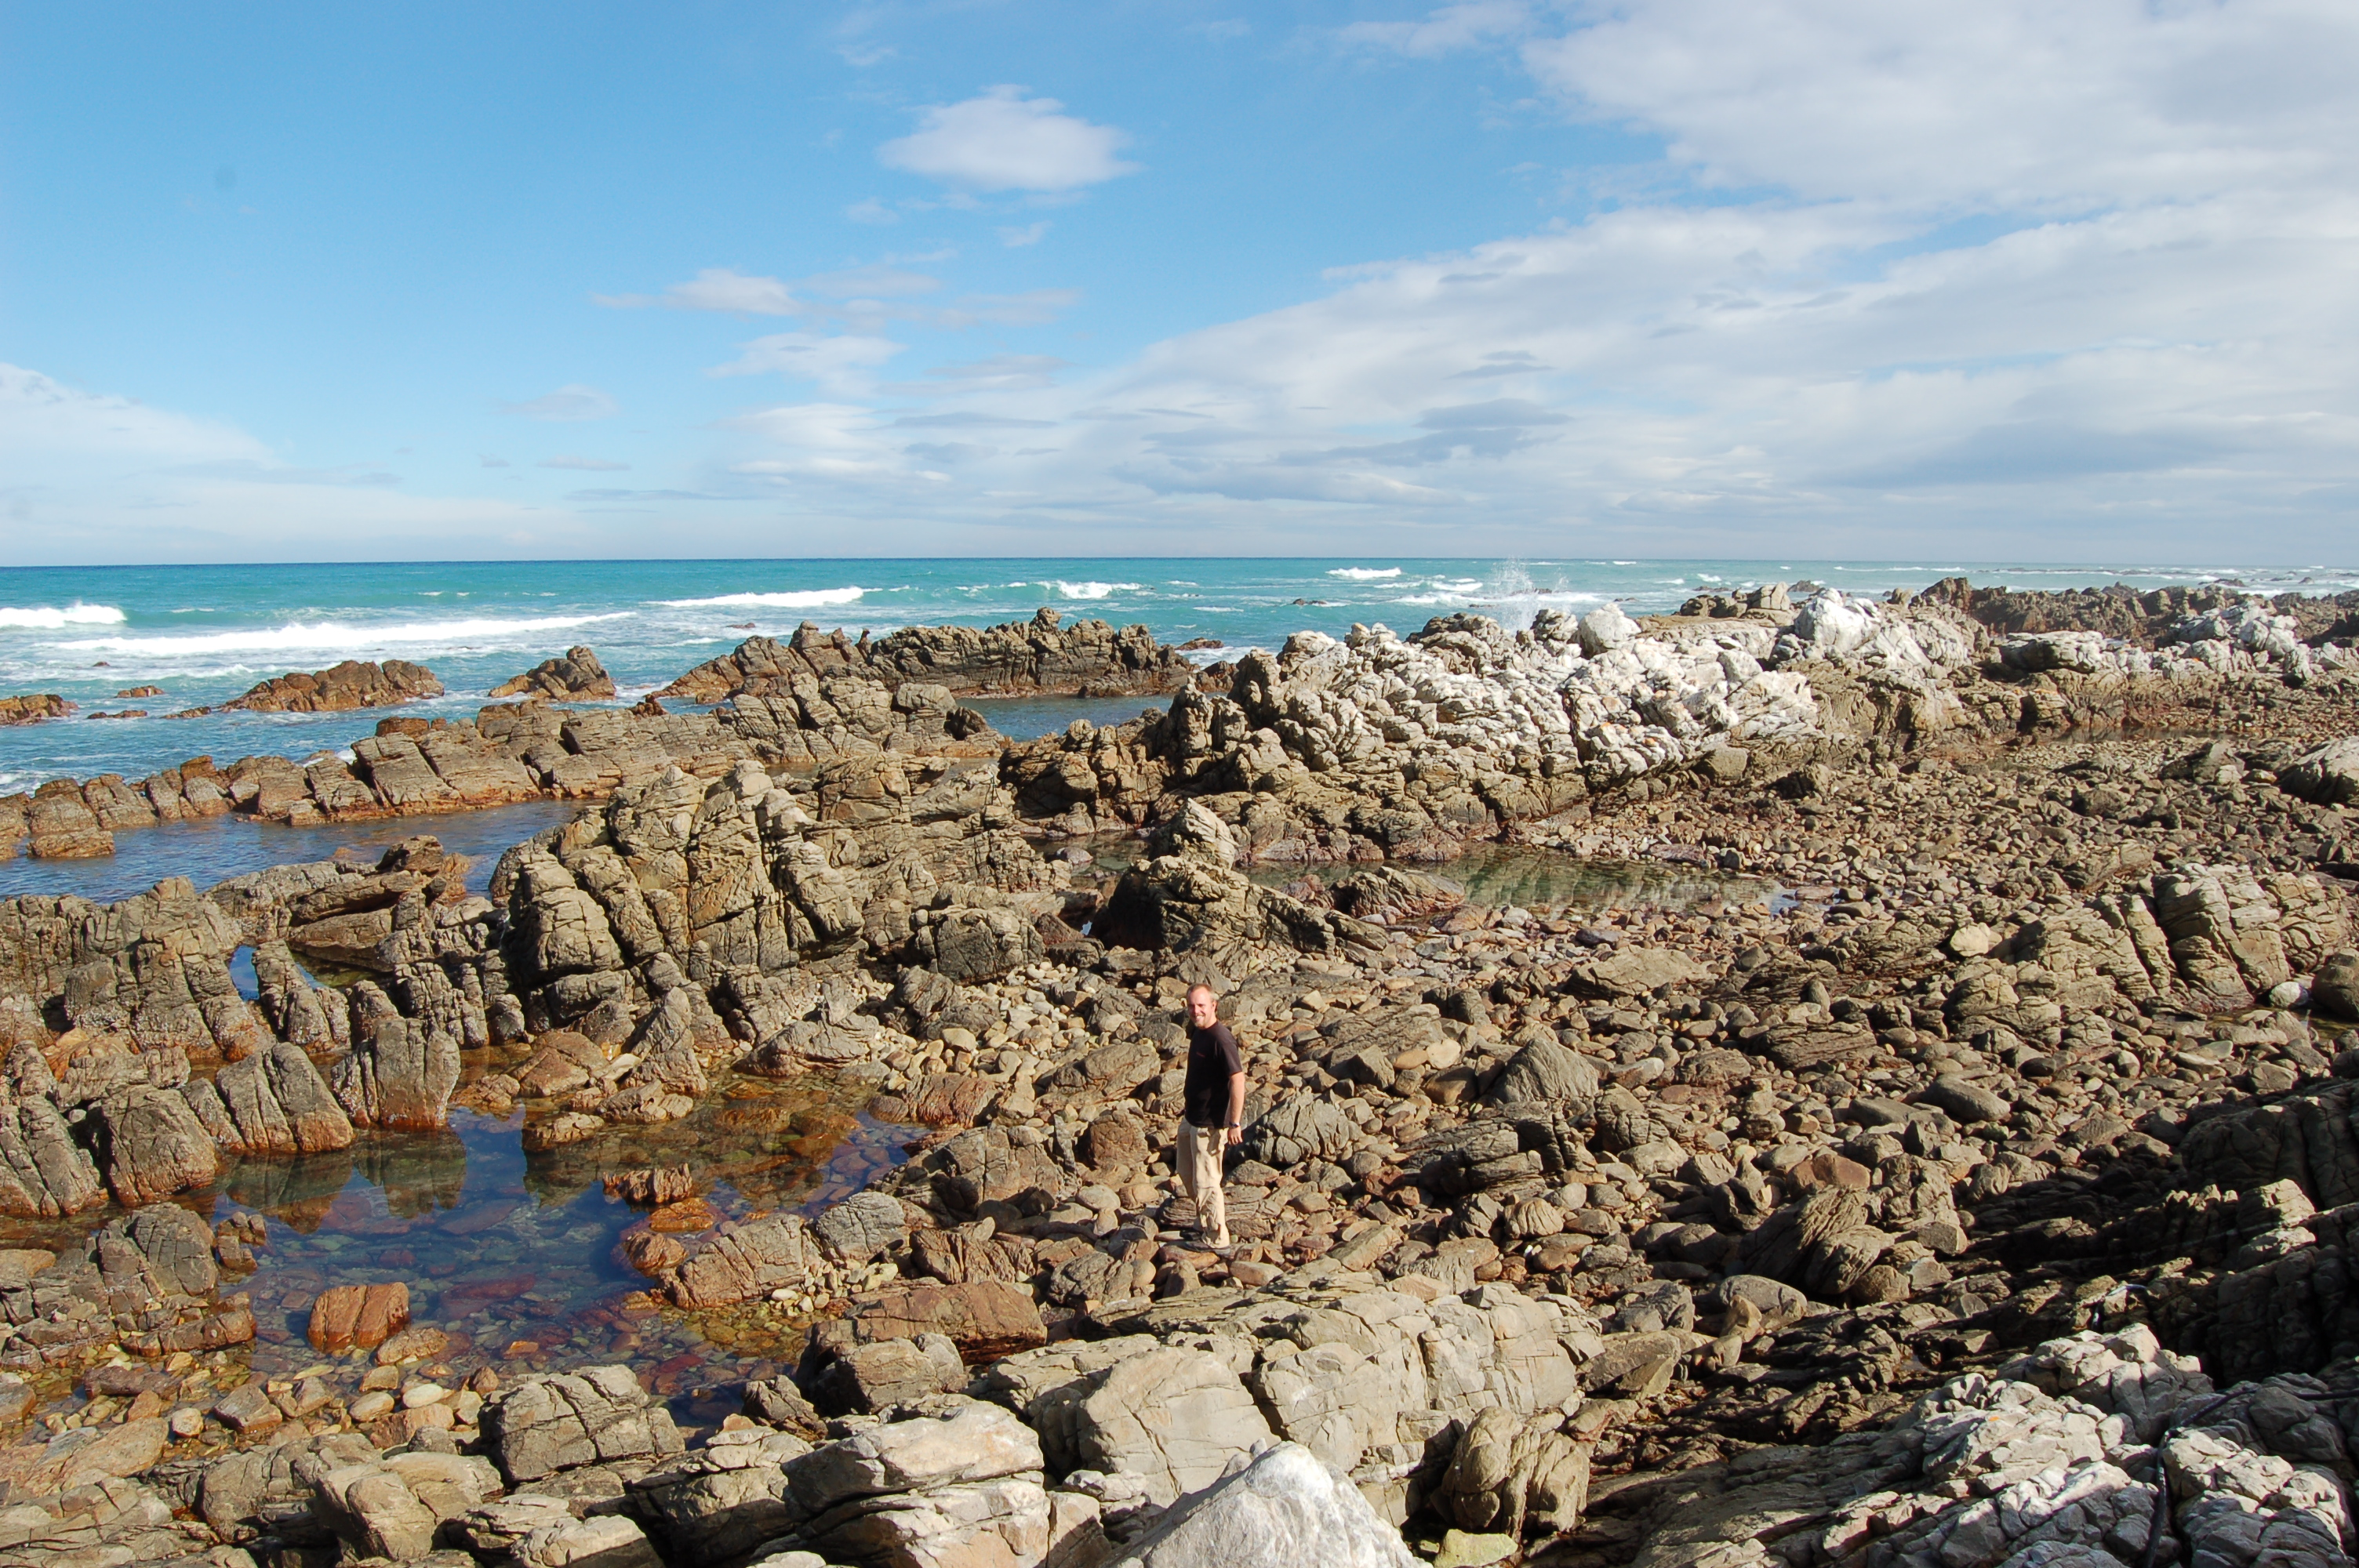 E >> File:Cape Agulhas, South Africa (3225991064).jpg - Wikimedia Commons